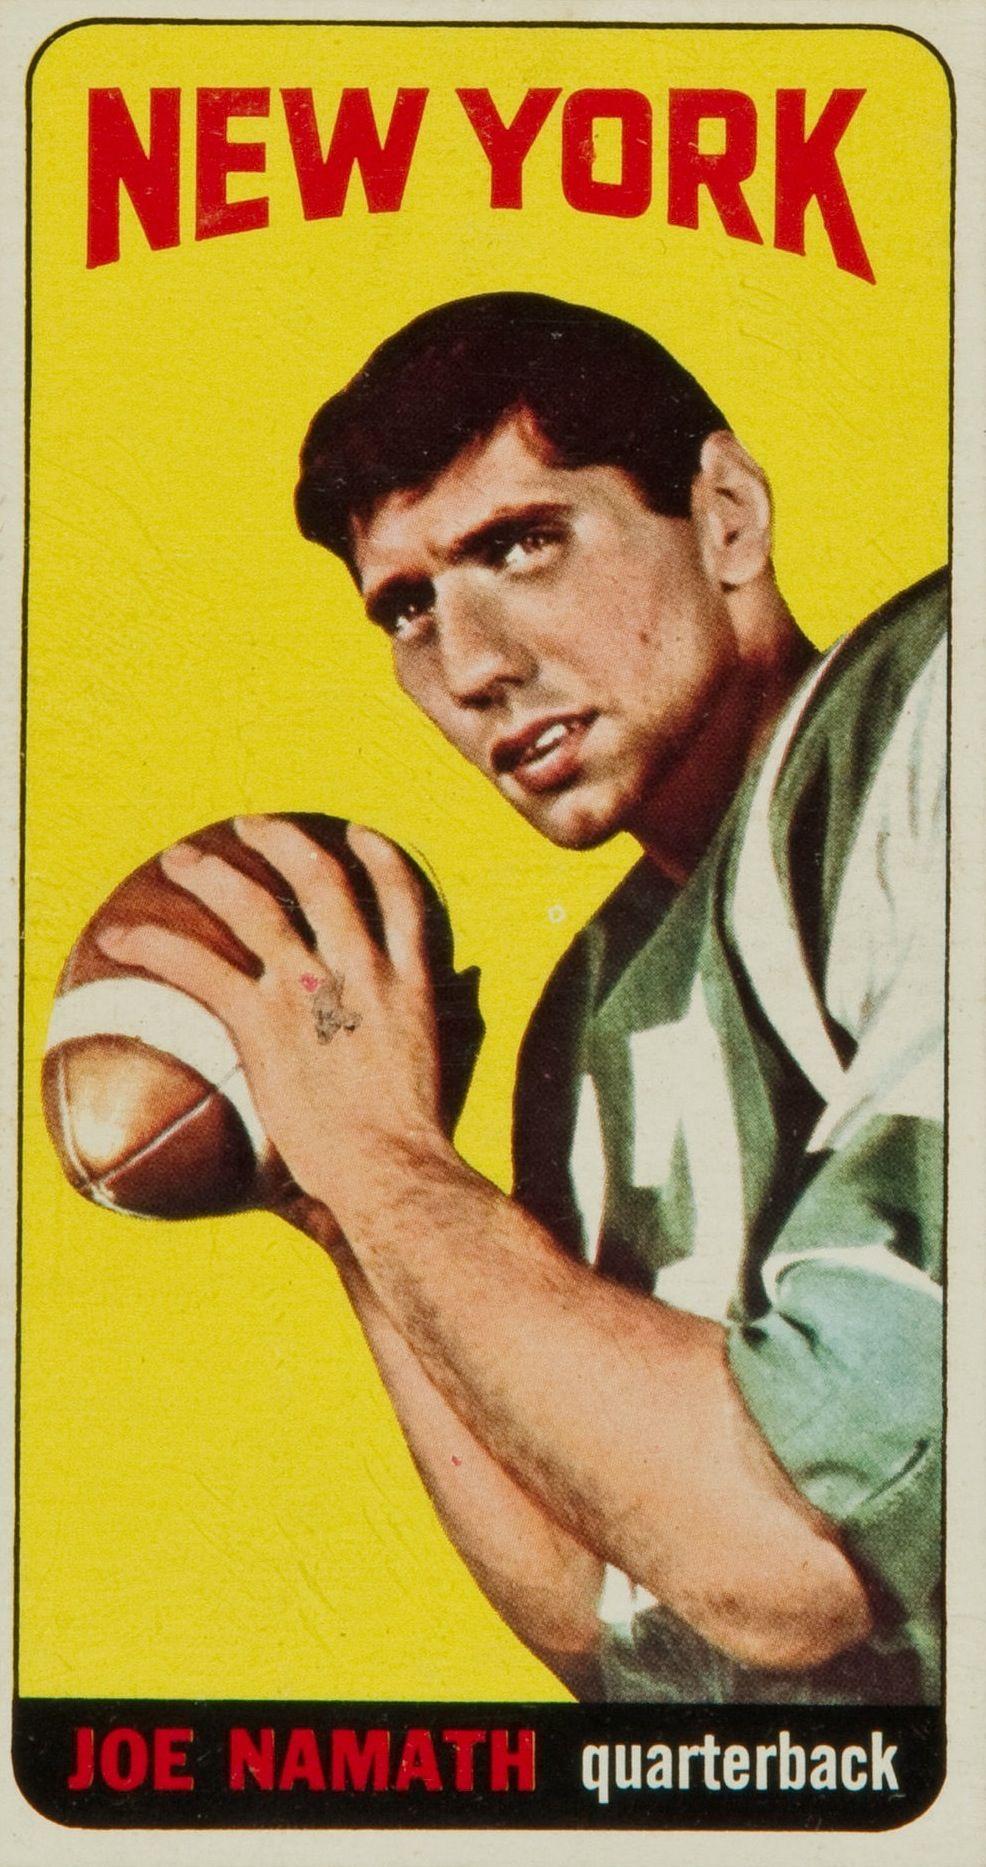 1965 Topps Vintage Football Card Joe Namath • Broadway